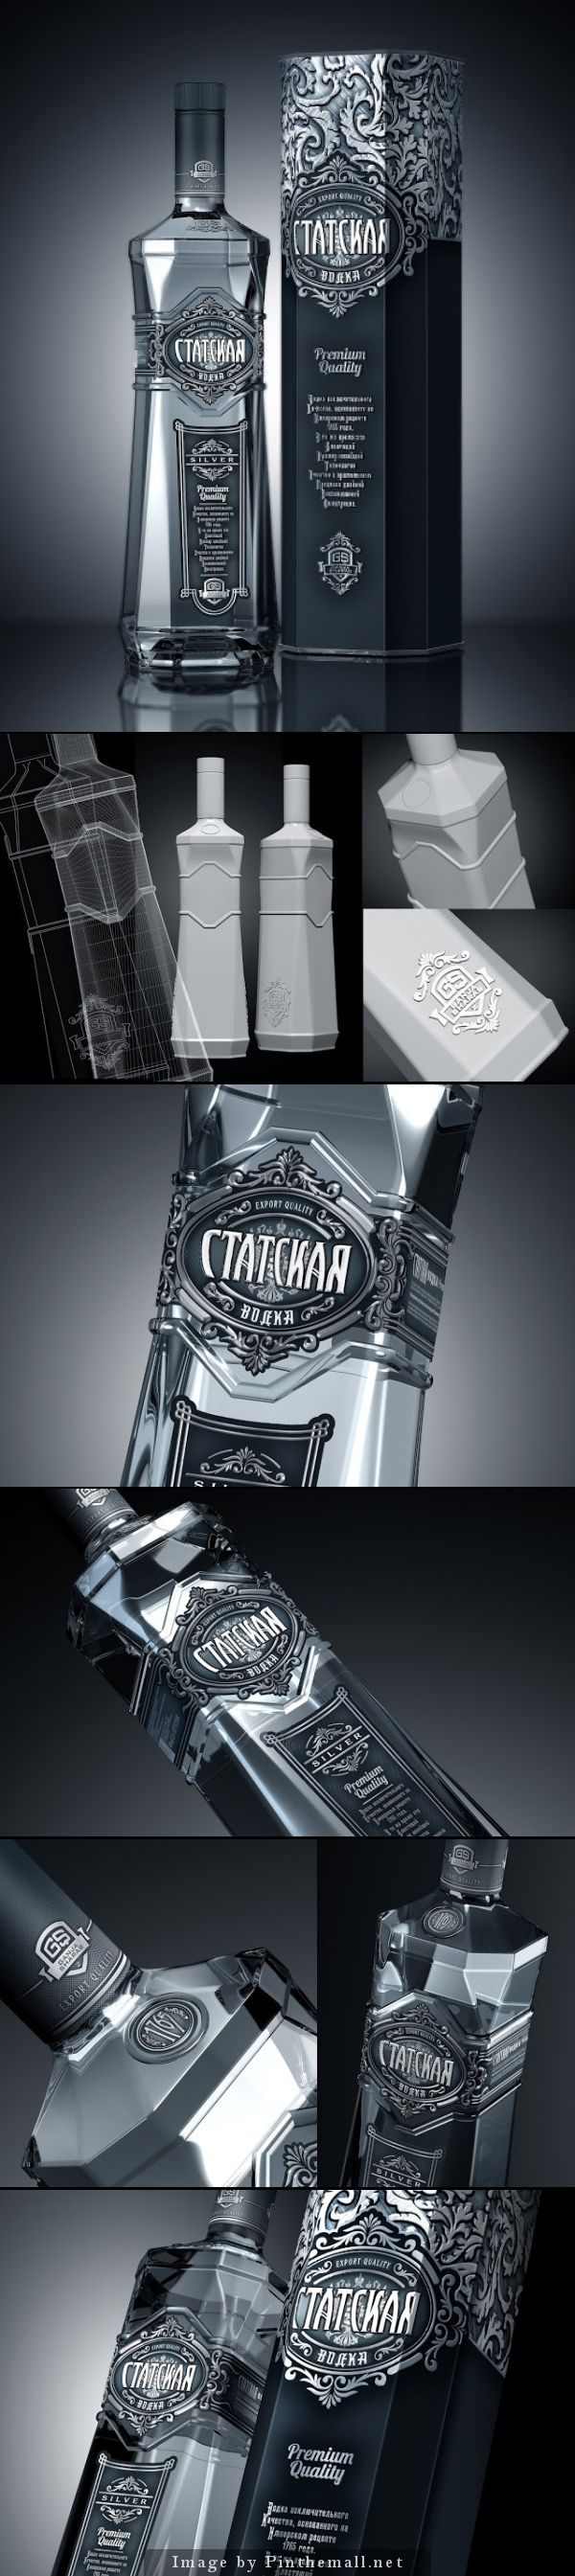 Statskaya Premium Vodka Agency: DSG Creative Design Production Client: